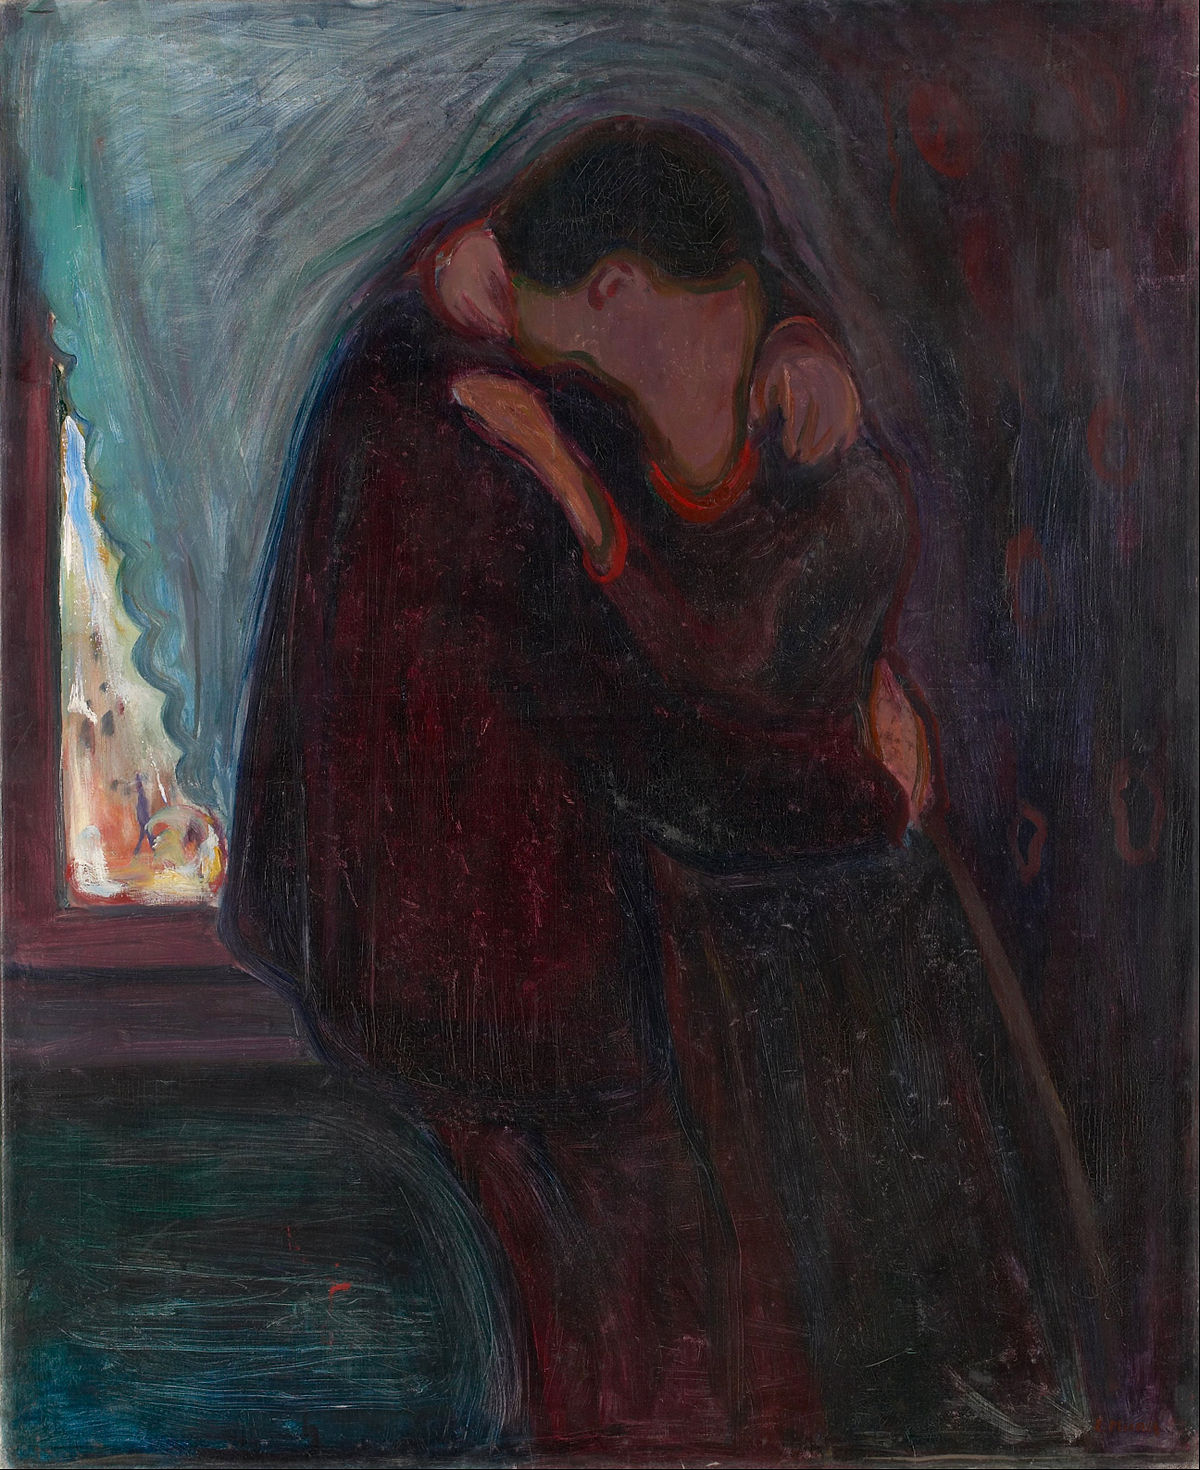 1200px-Edvard_Munch_-_The_Kiss_-_Google_Art_Project